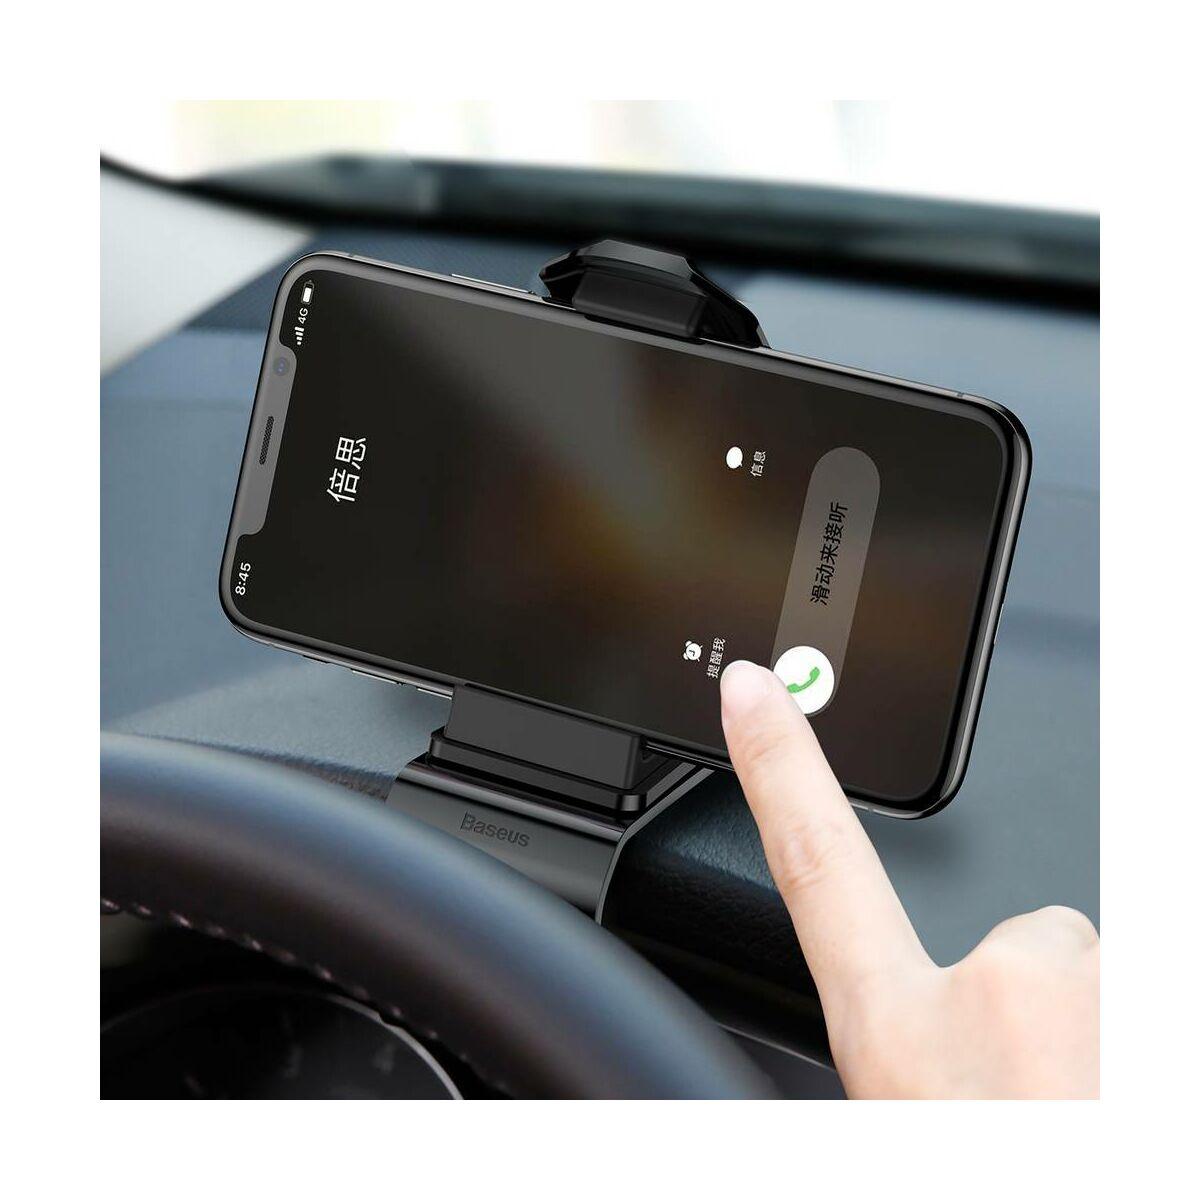 Baseus autós telefontartó, Big series, fekete (SUDZ-01)